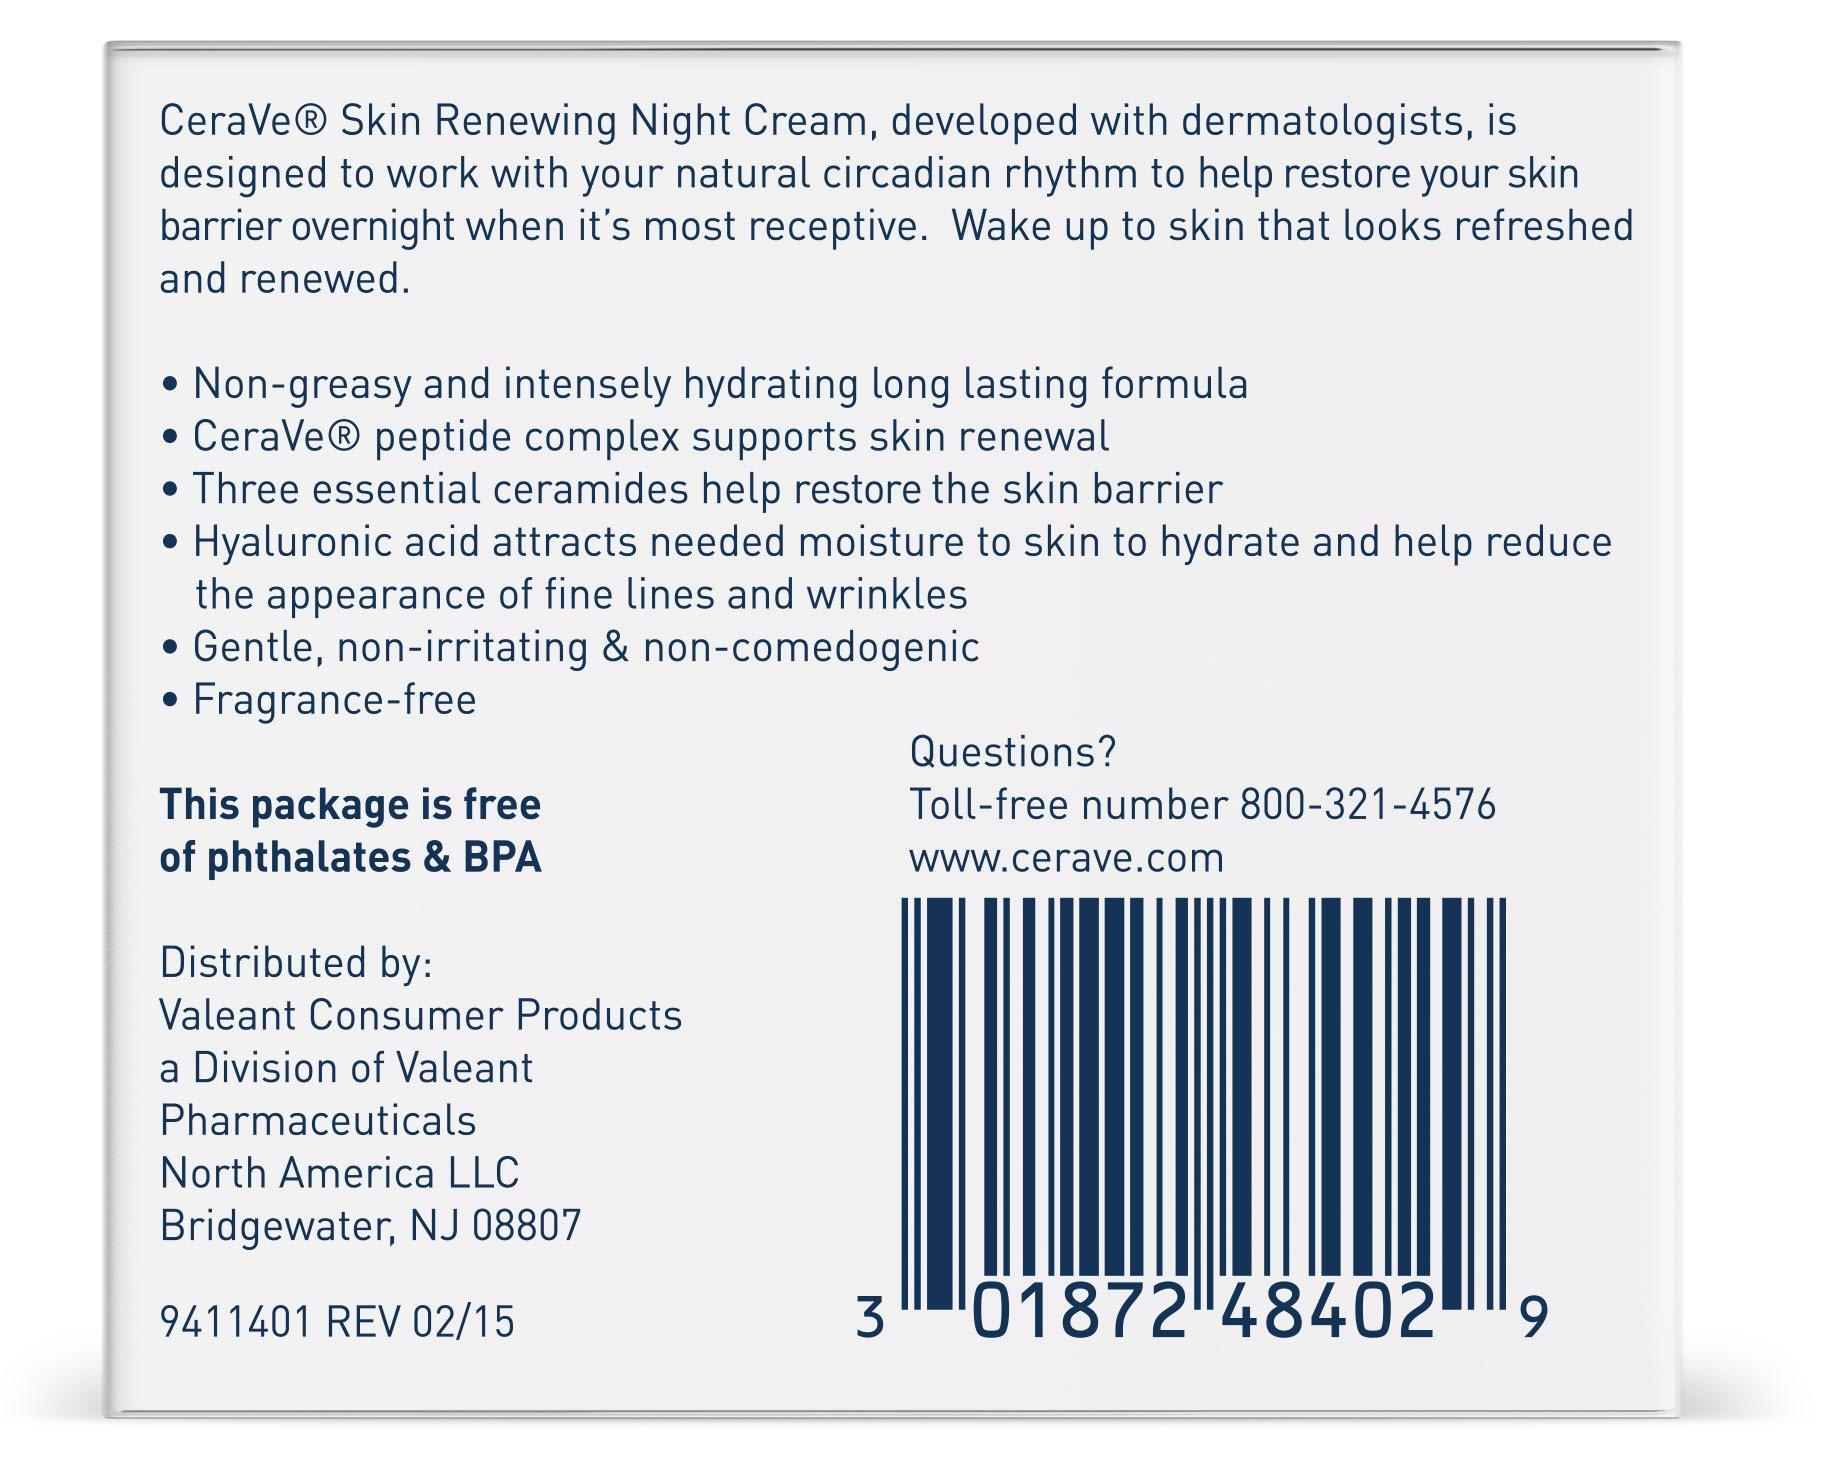 CeraVe Skin Renewing Night Cream - Multipurpose Night Cream, Face Moisturizer, Anti Aging Face Cream & Wrinkle Cream – Moisturizer for Face w Hyaluronic Acid & Niacinamide, 1.7 oz by CeraVe (Image #2)